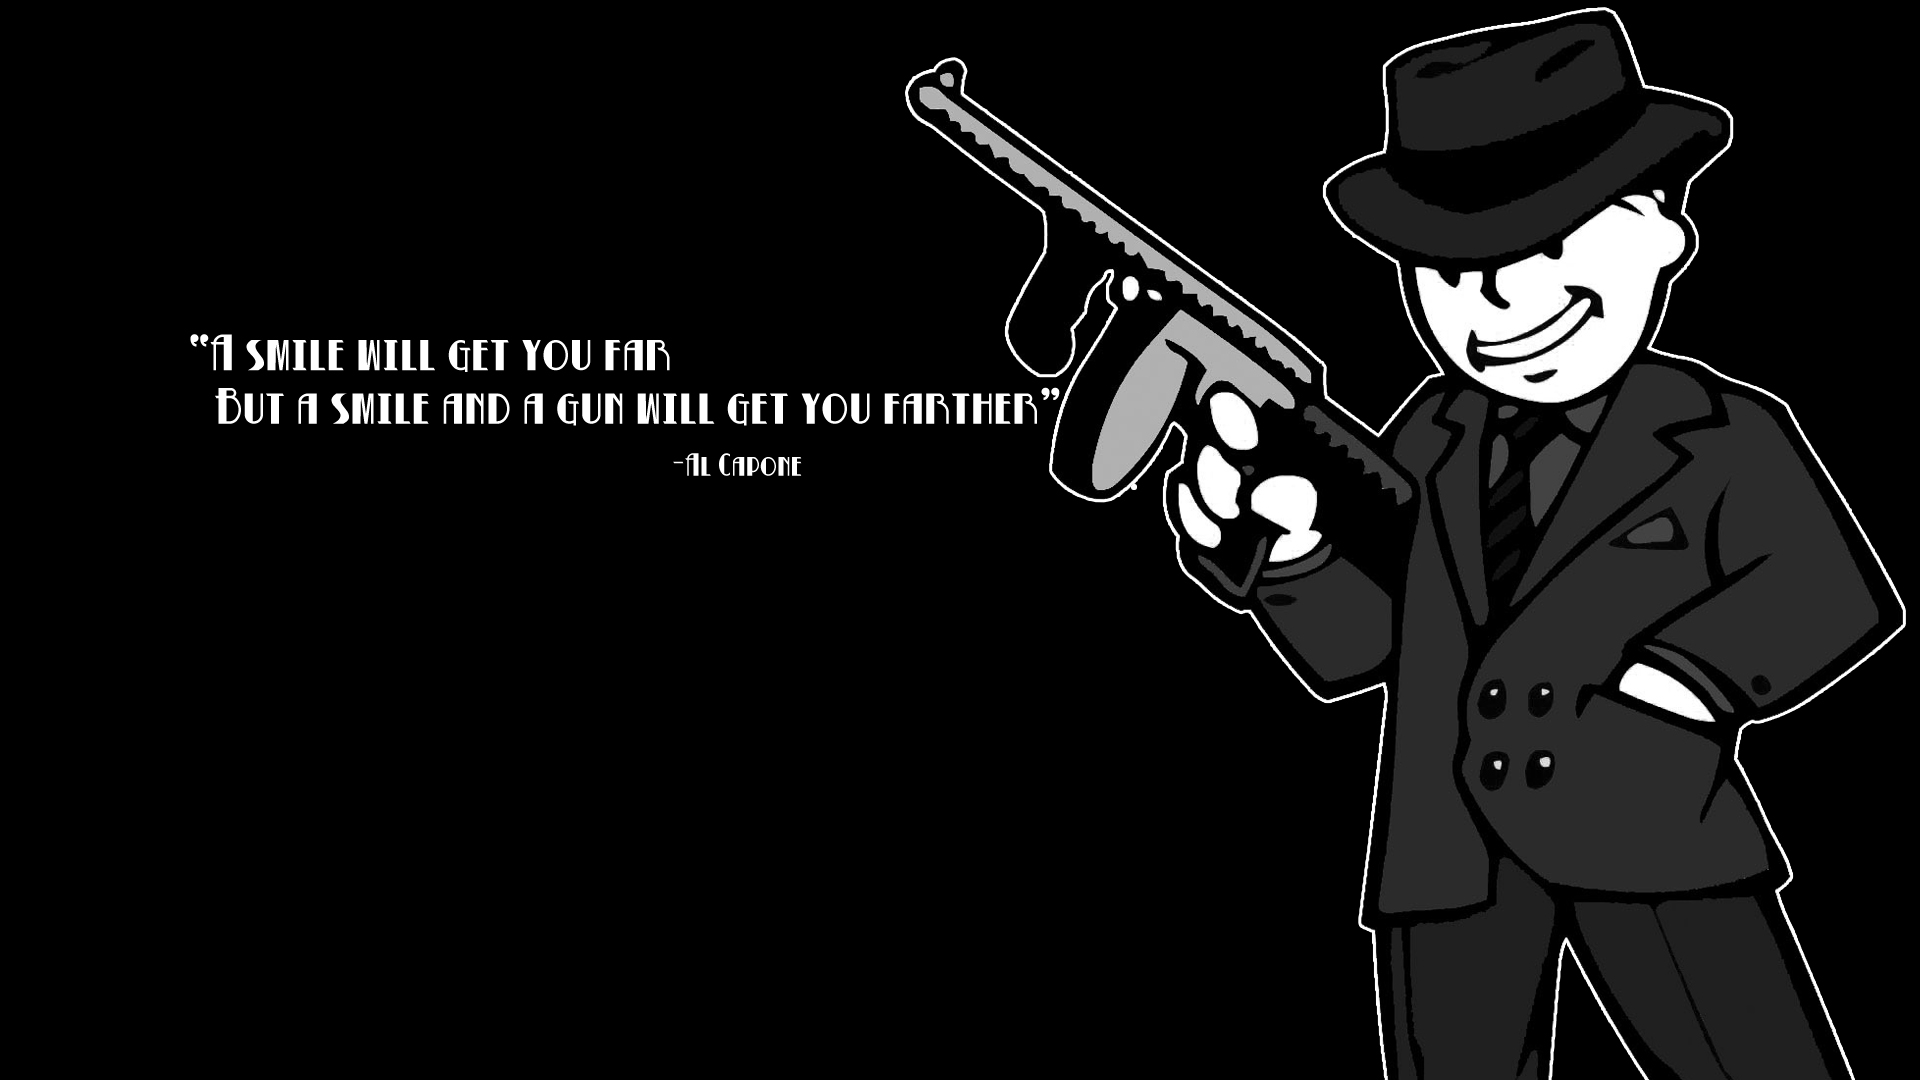 FALLOUT Weapon Gun Text Quote Dark Wallpaper